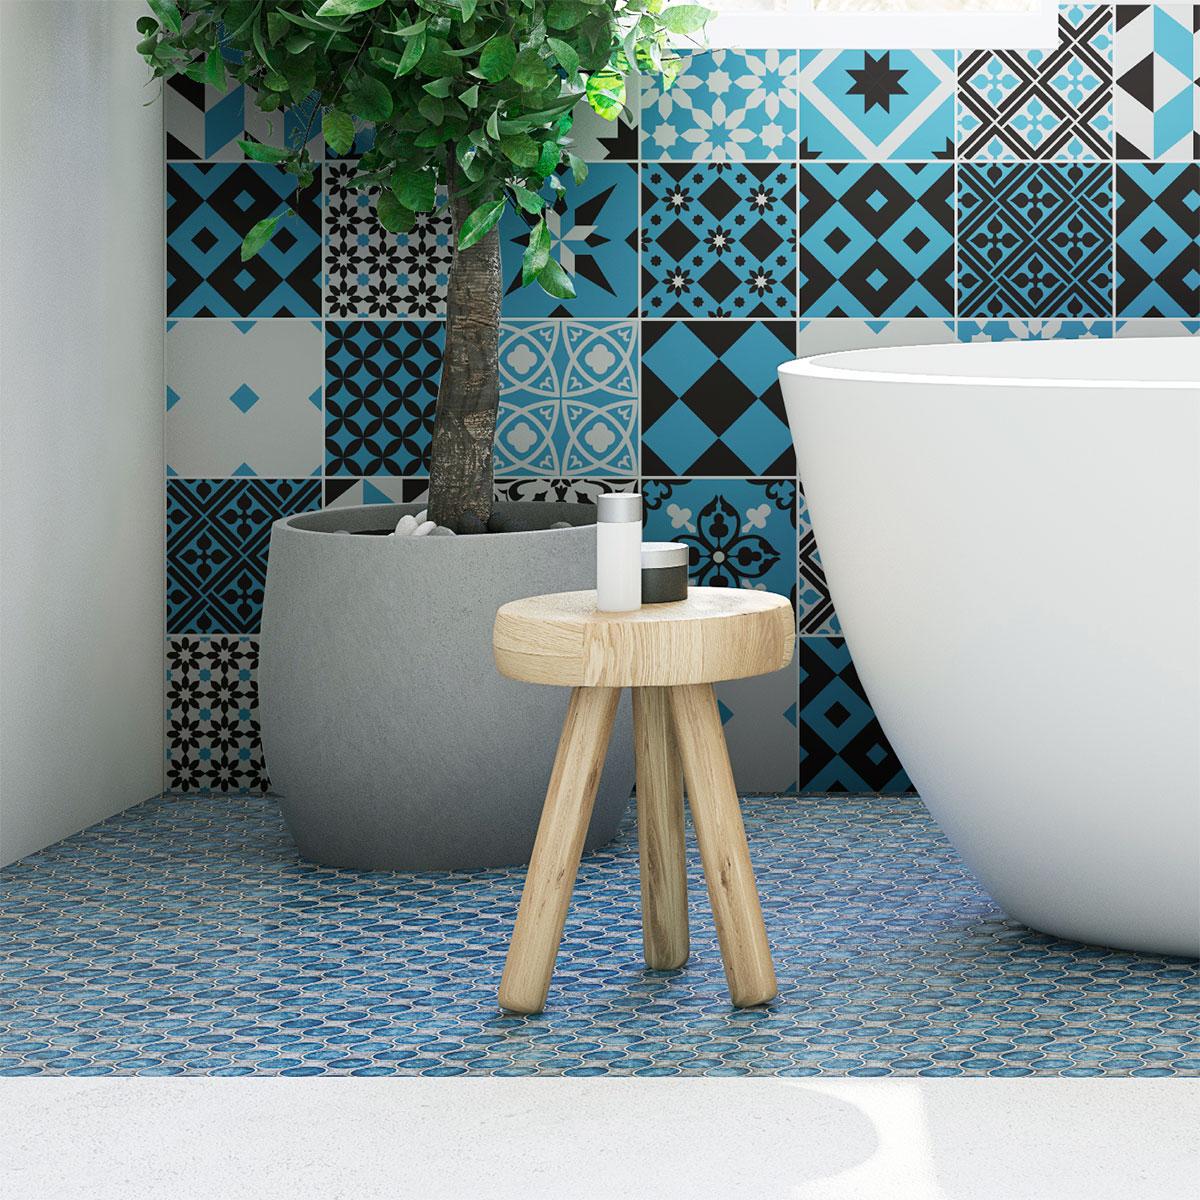 30 Wall Stickers Cement Tiles Azulejos Talia Quote Wall Bathroom Bathroom Walls Ambiance Sticker